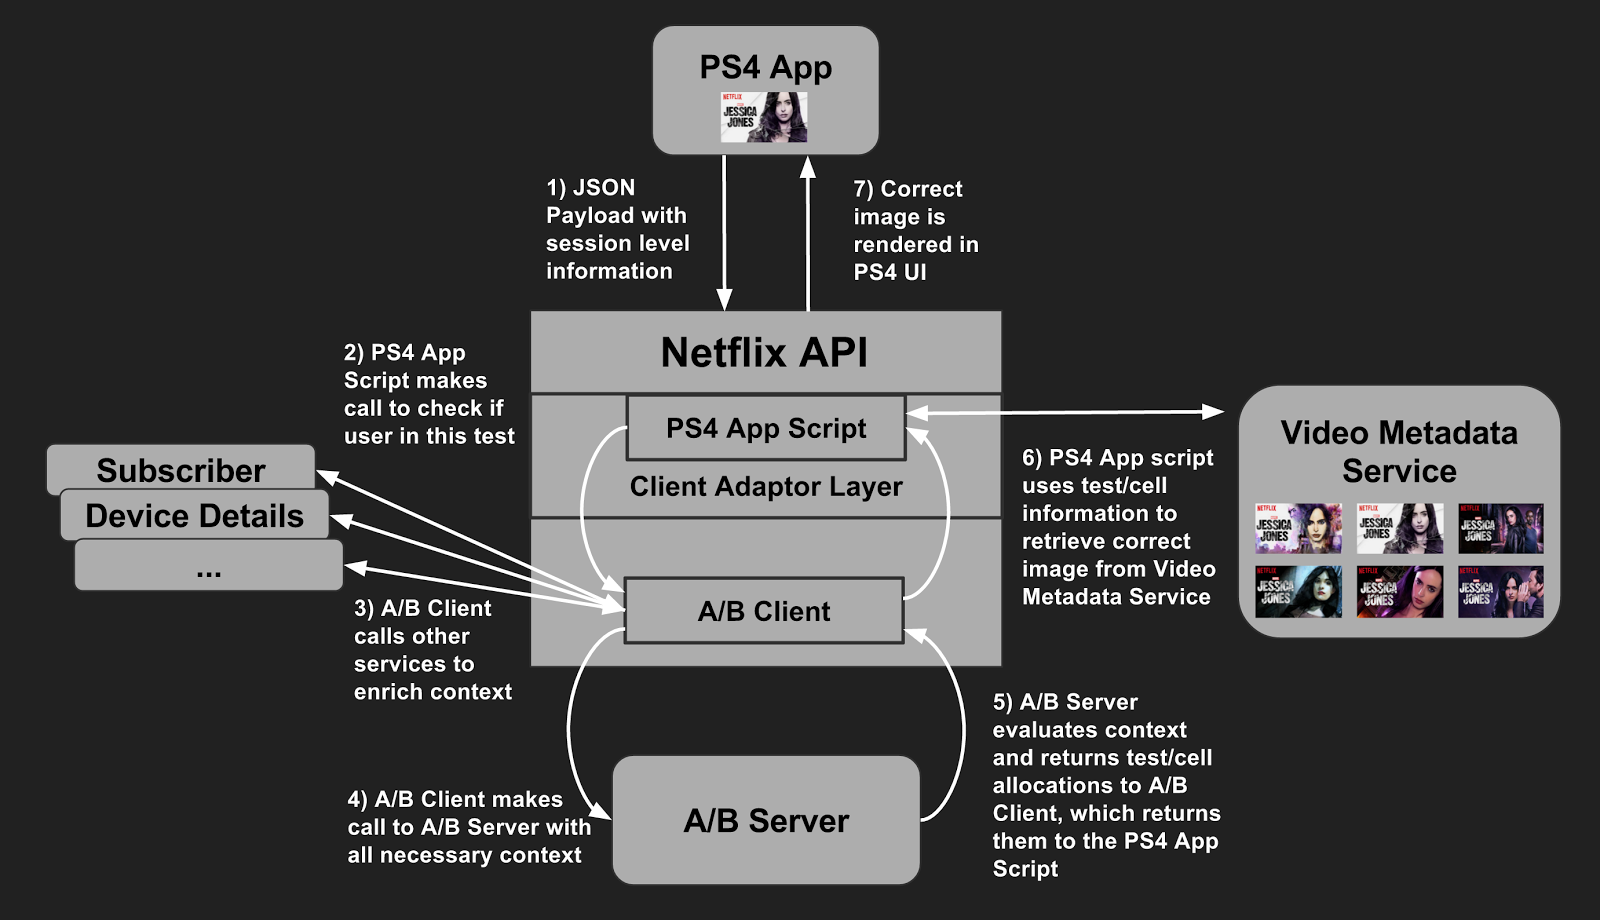 Workflow típico de un A/B testing en Netflix. Fuente: Netflix Tech Blog